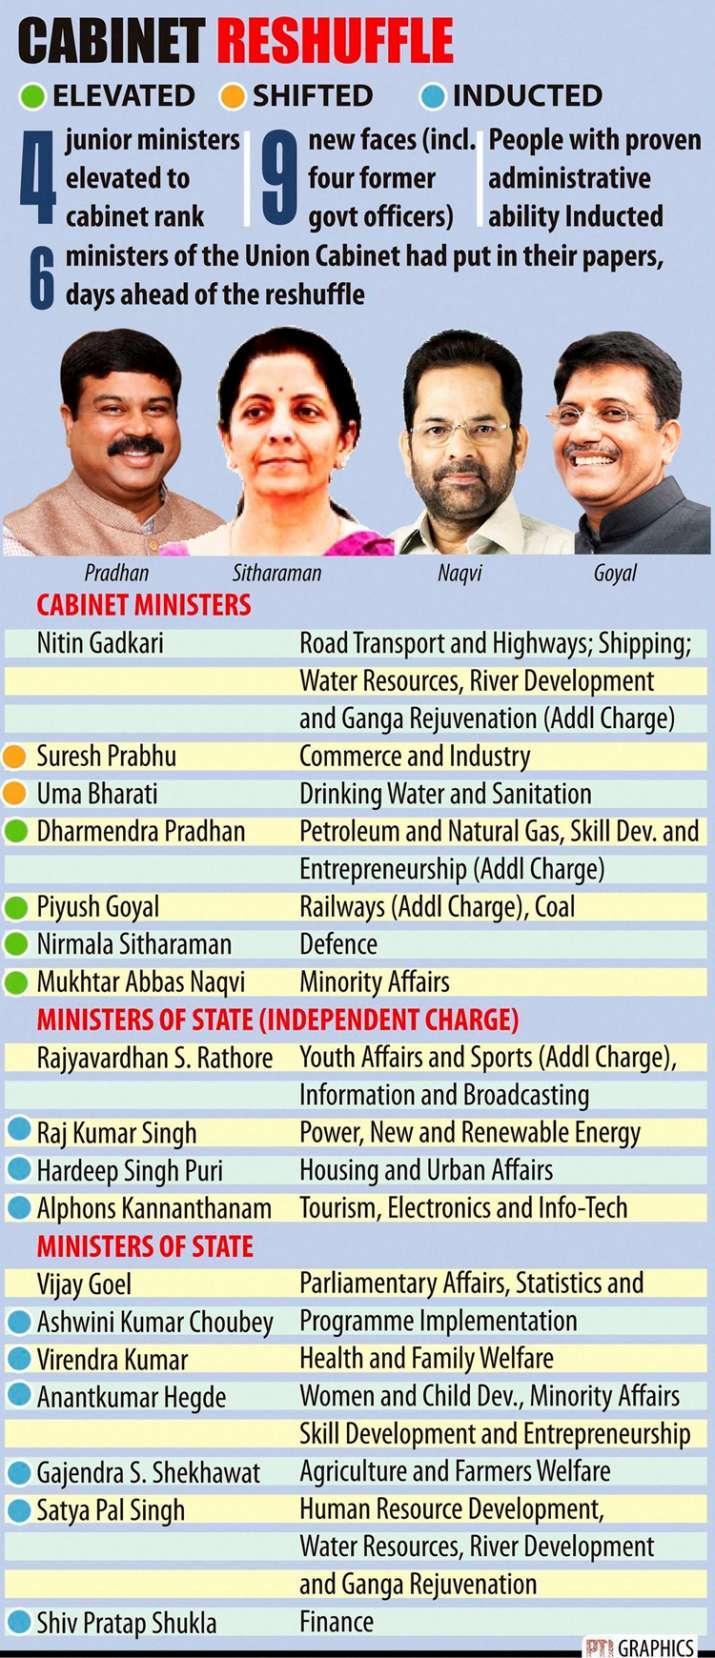 India Tv - Modi Cabinet reshuffle